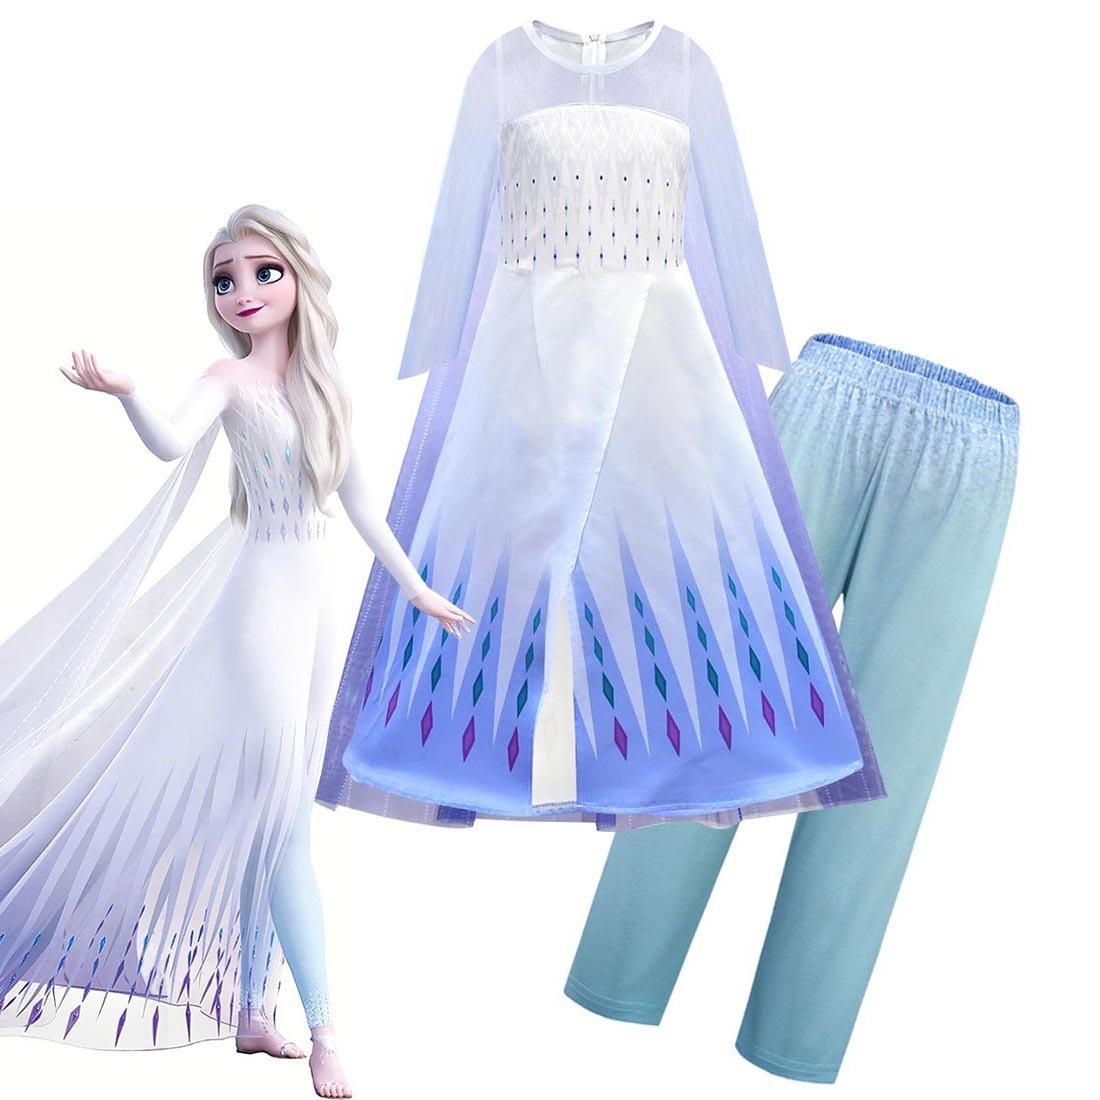 2020 New Snow Queen Anna Elsa Princess Cosplay Costume Outfit Full Set Halloween Costumes Fancy Dress Cloak Pants Set